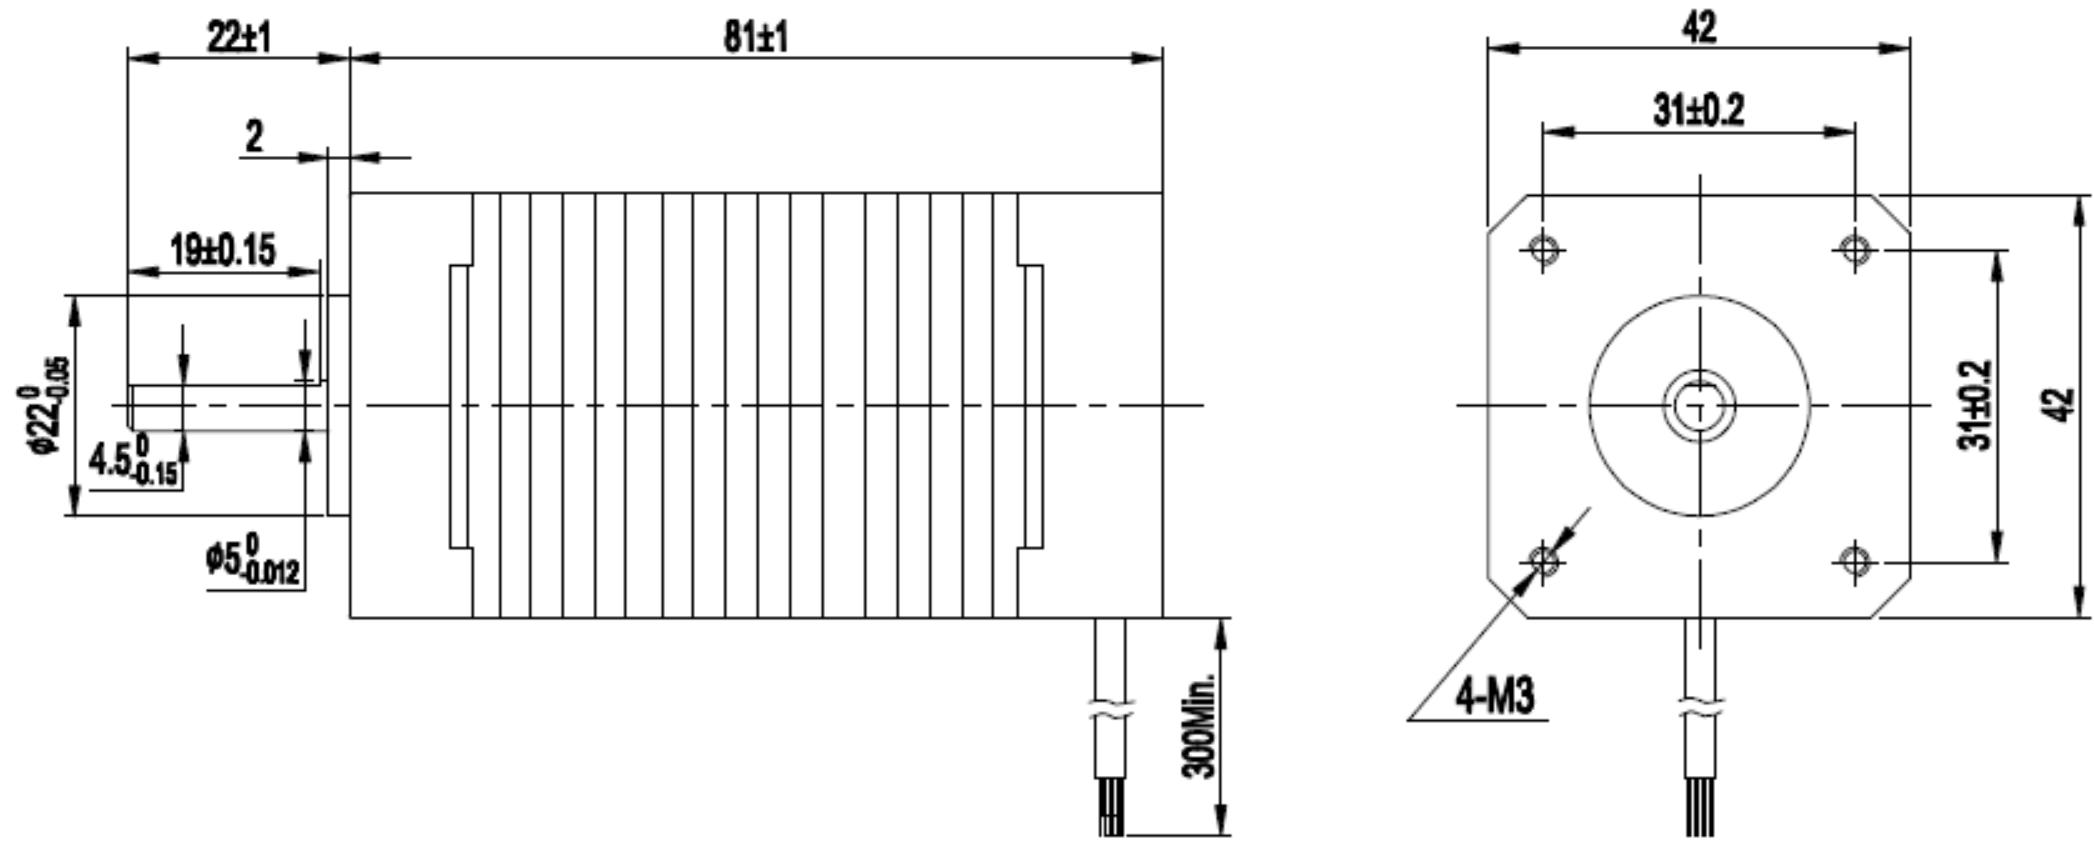 GM42BLF81-240 Brushless DC Motor Dimensions